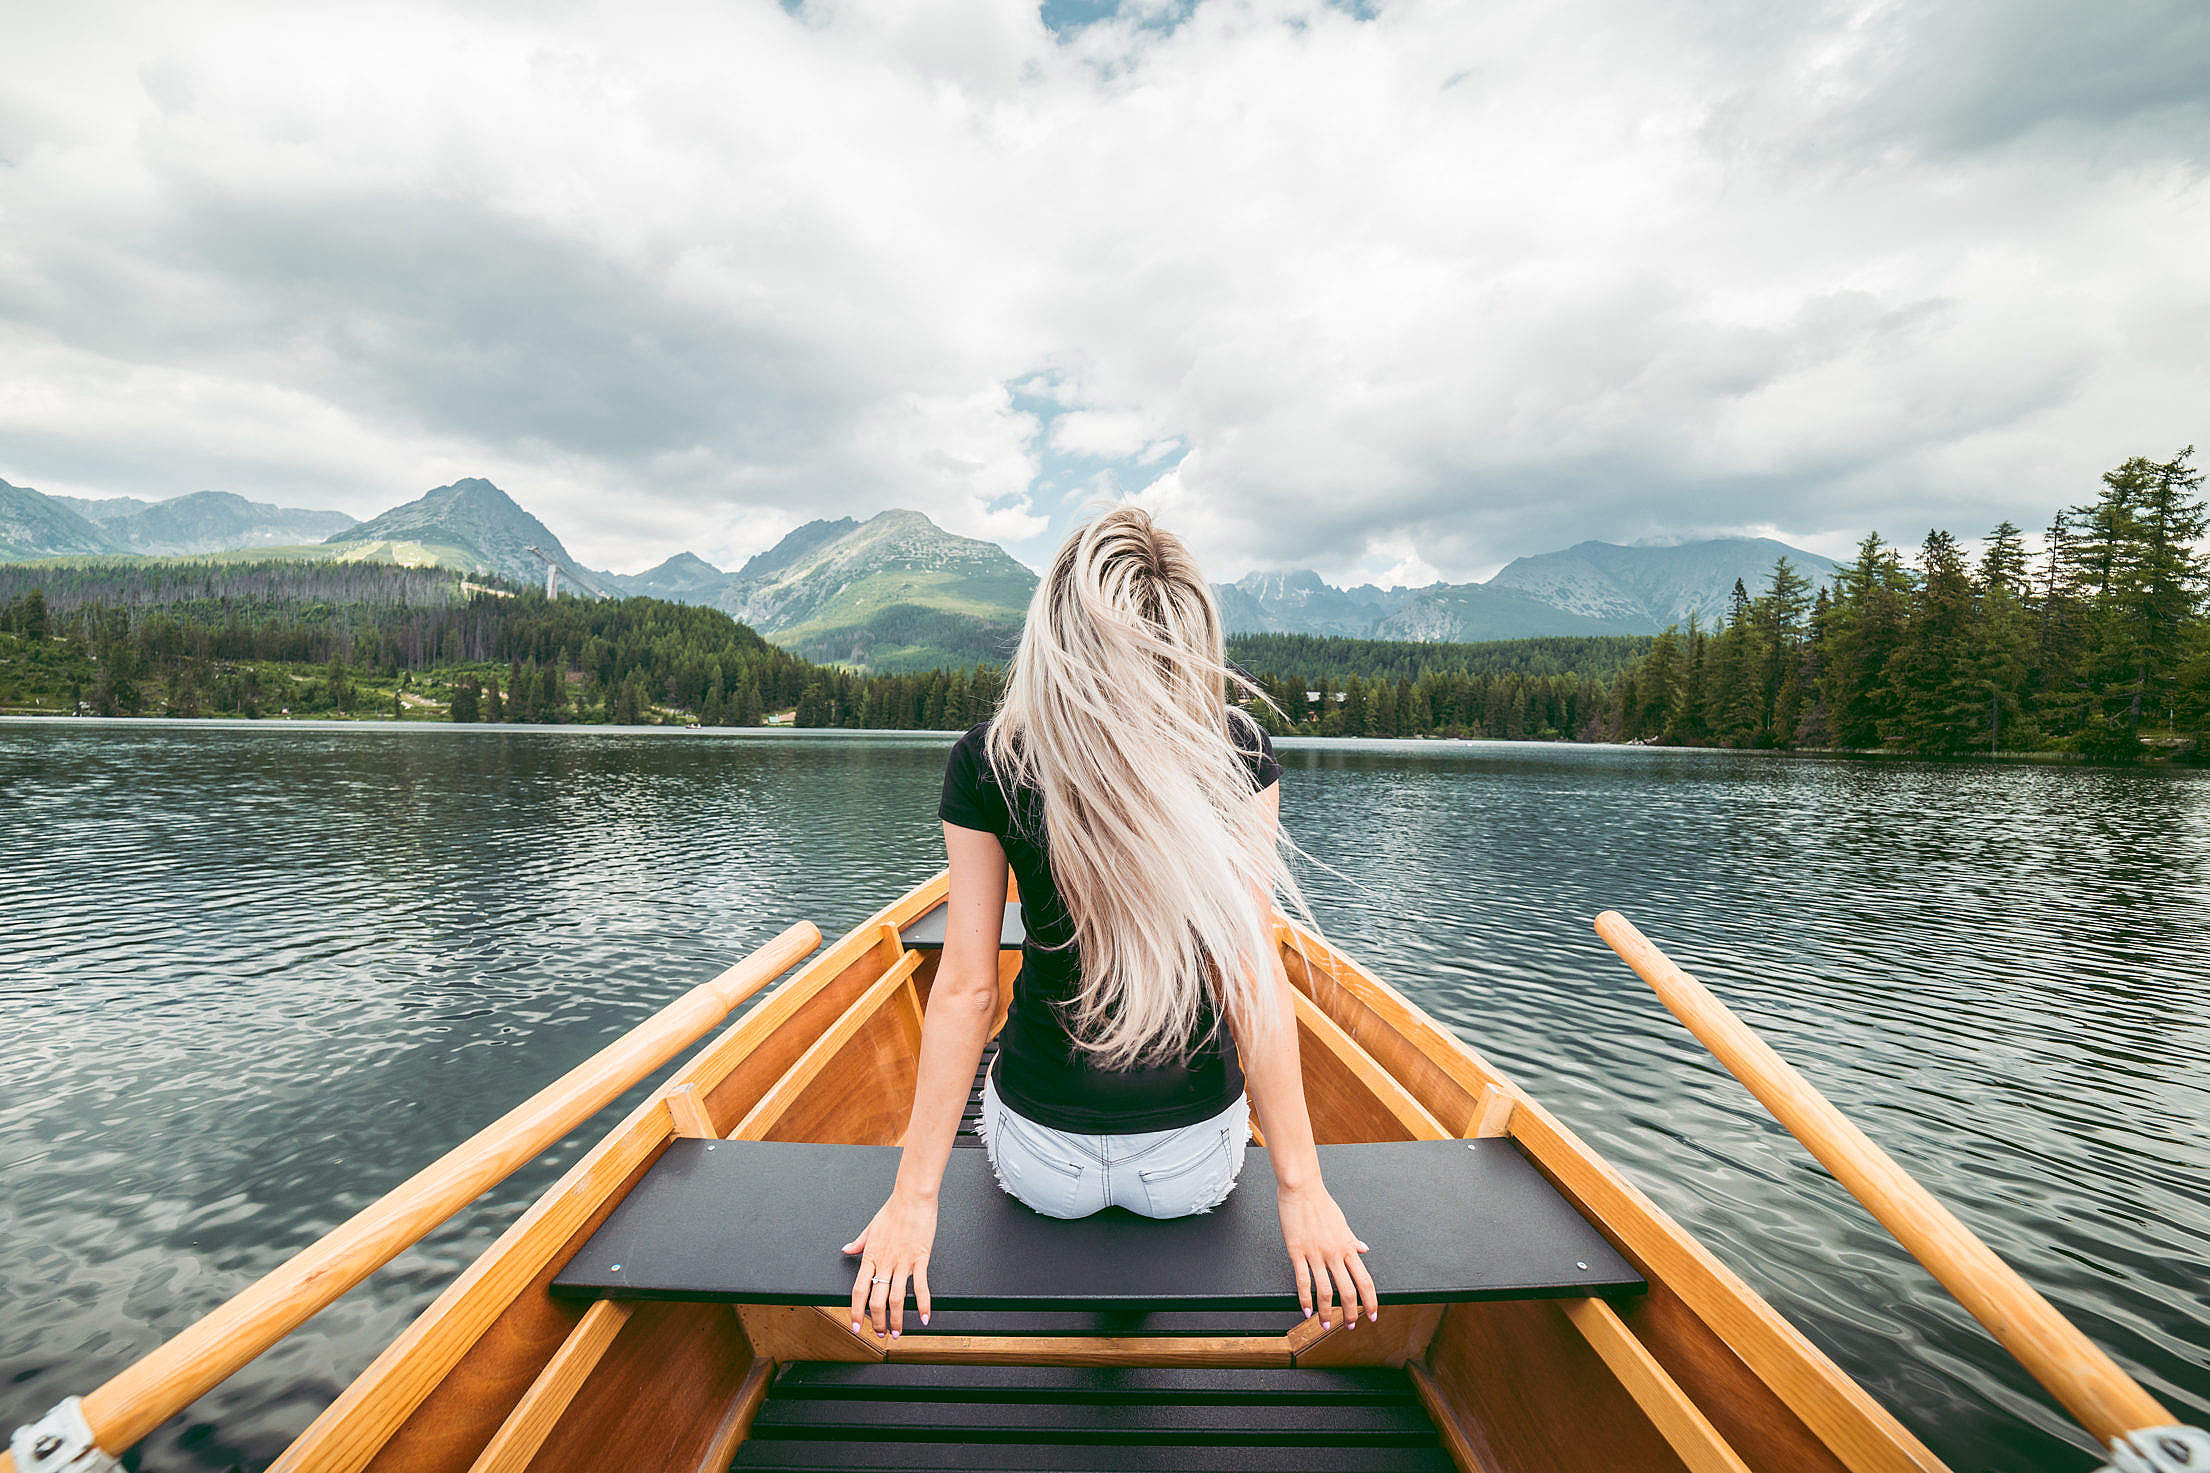 Young Blonde Woman Enjoying a Rowing Boat Free Stock Photo